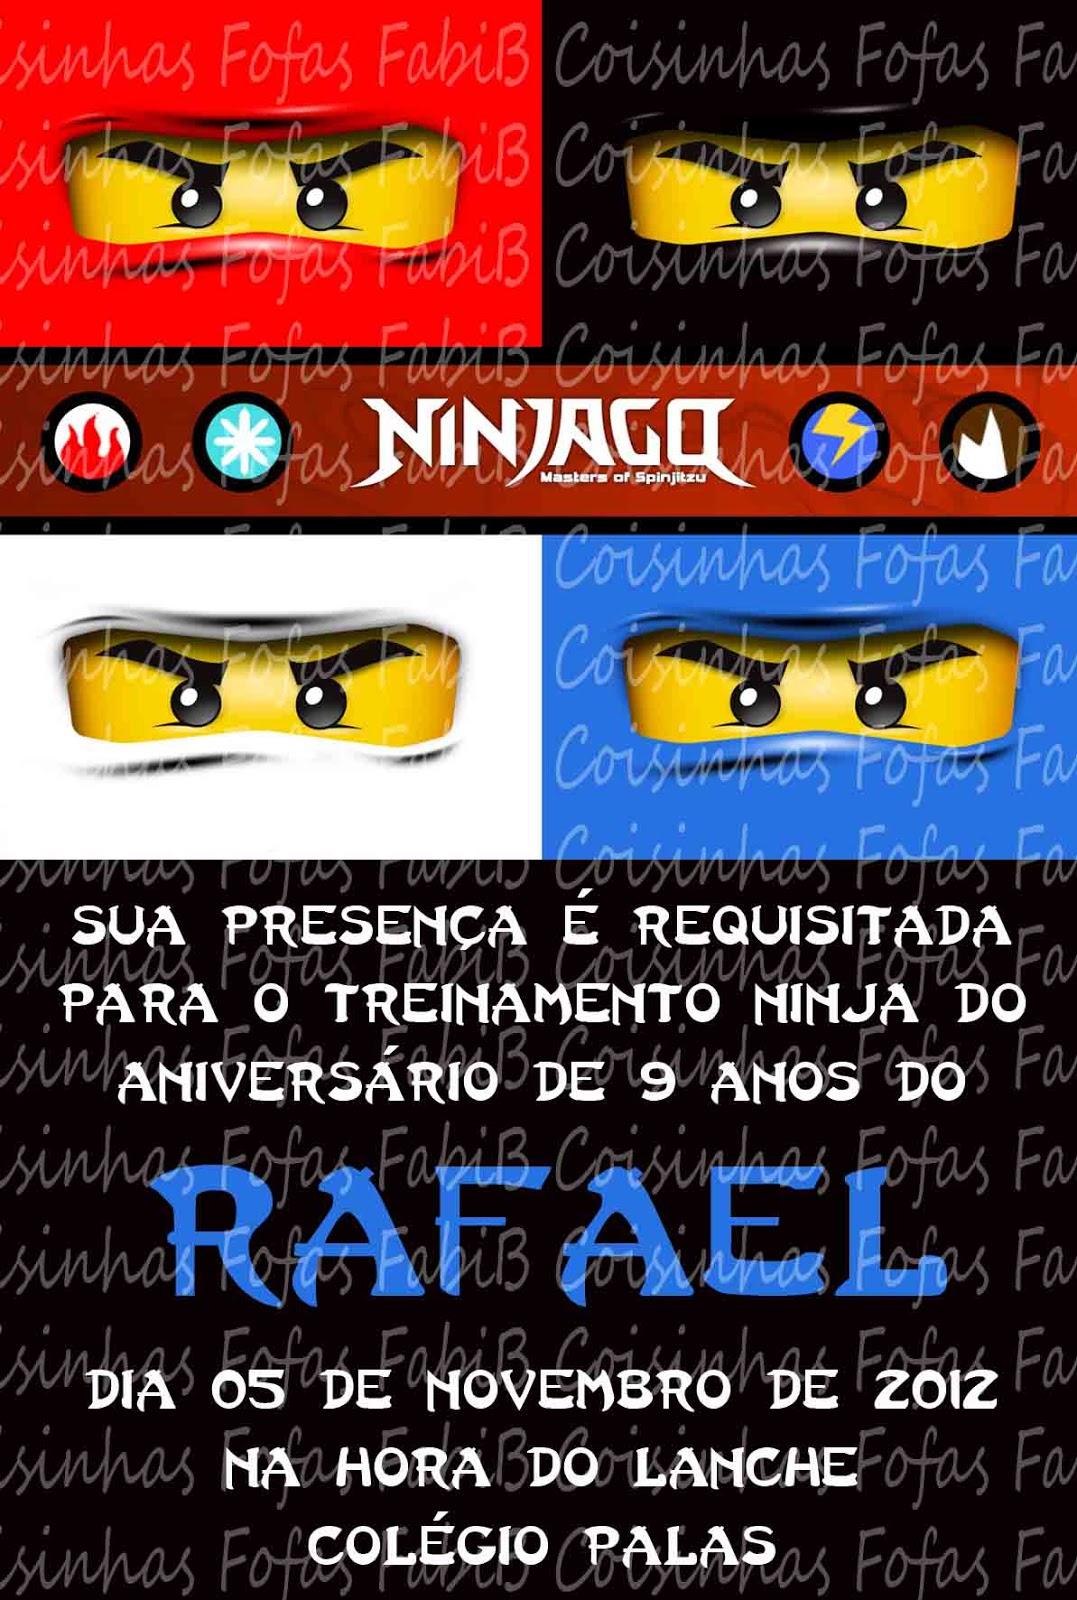 Fabib Convites Ninjago